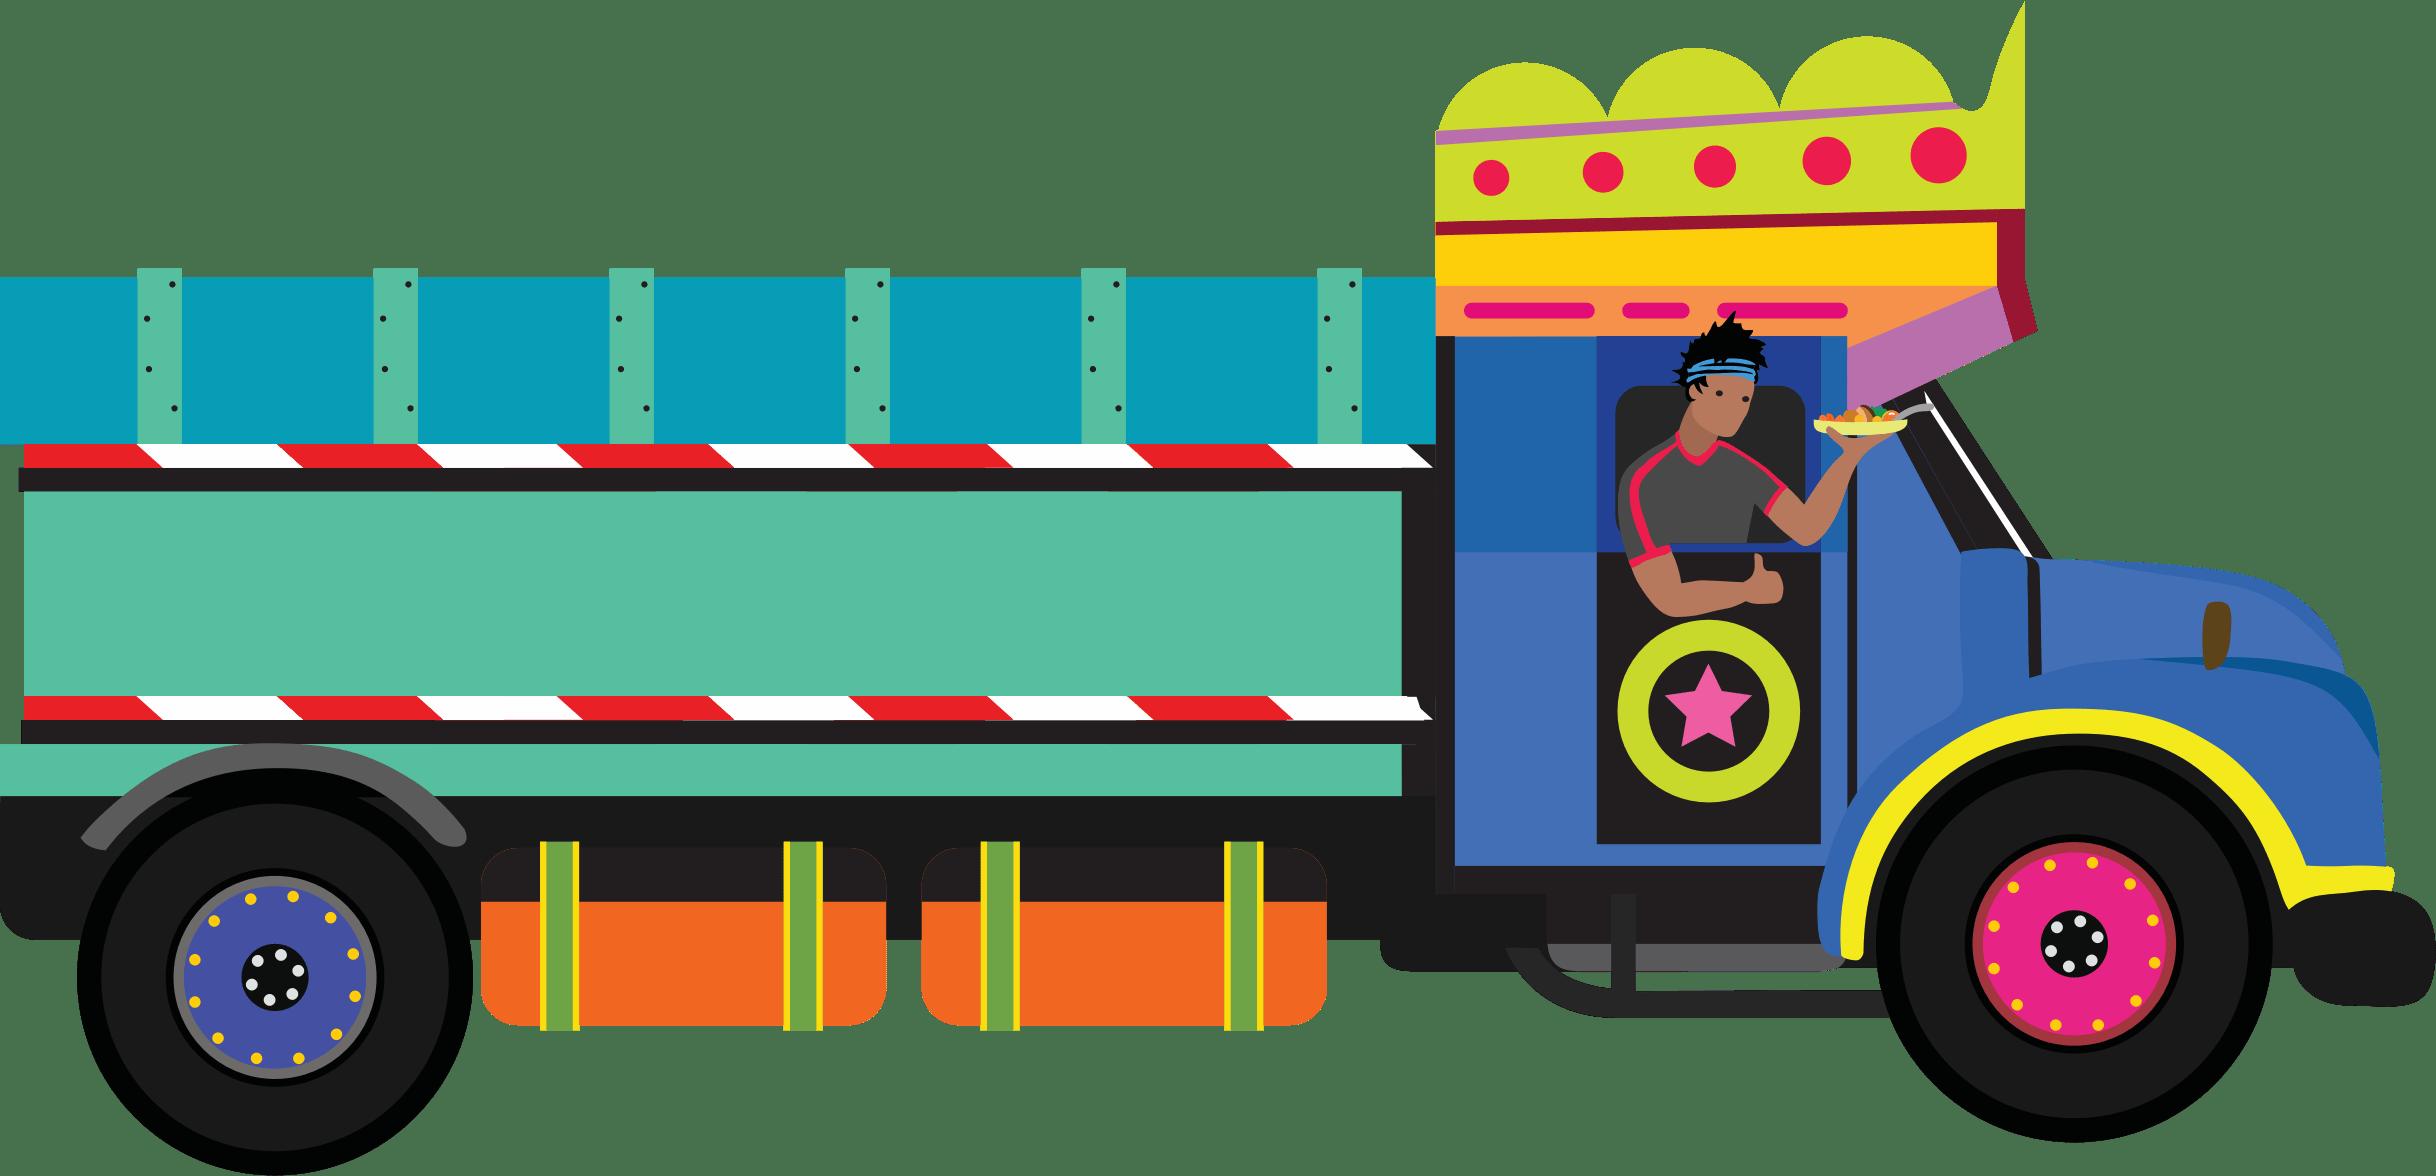 Chaat food cart illustration